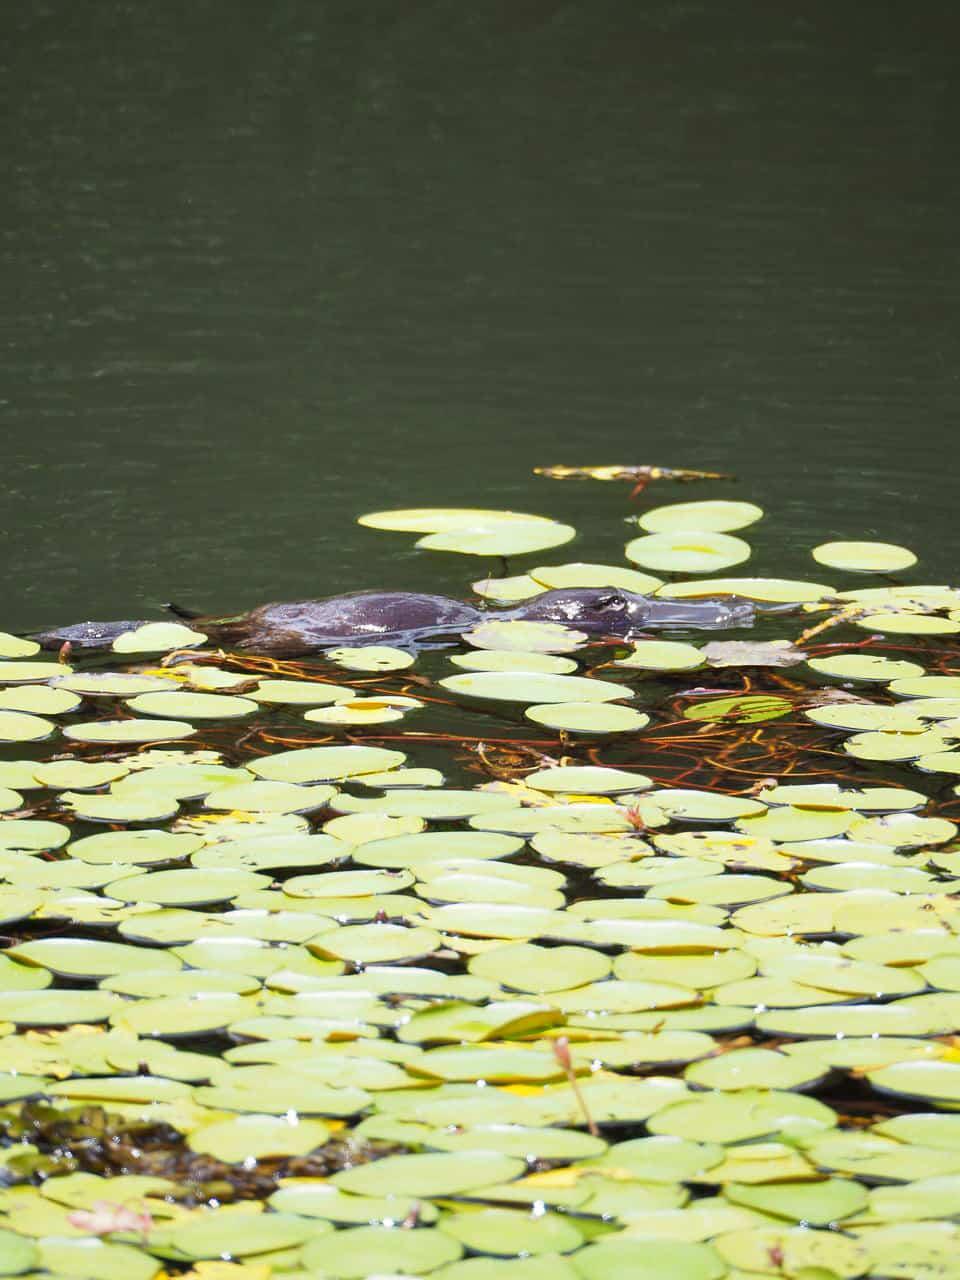 Australian-Platypus-Park-Atherton-Tablelands-North-Queensland-Australia ] Travel Mermaid 006